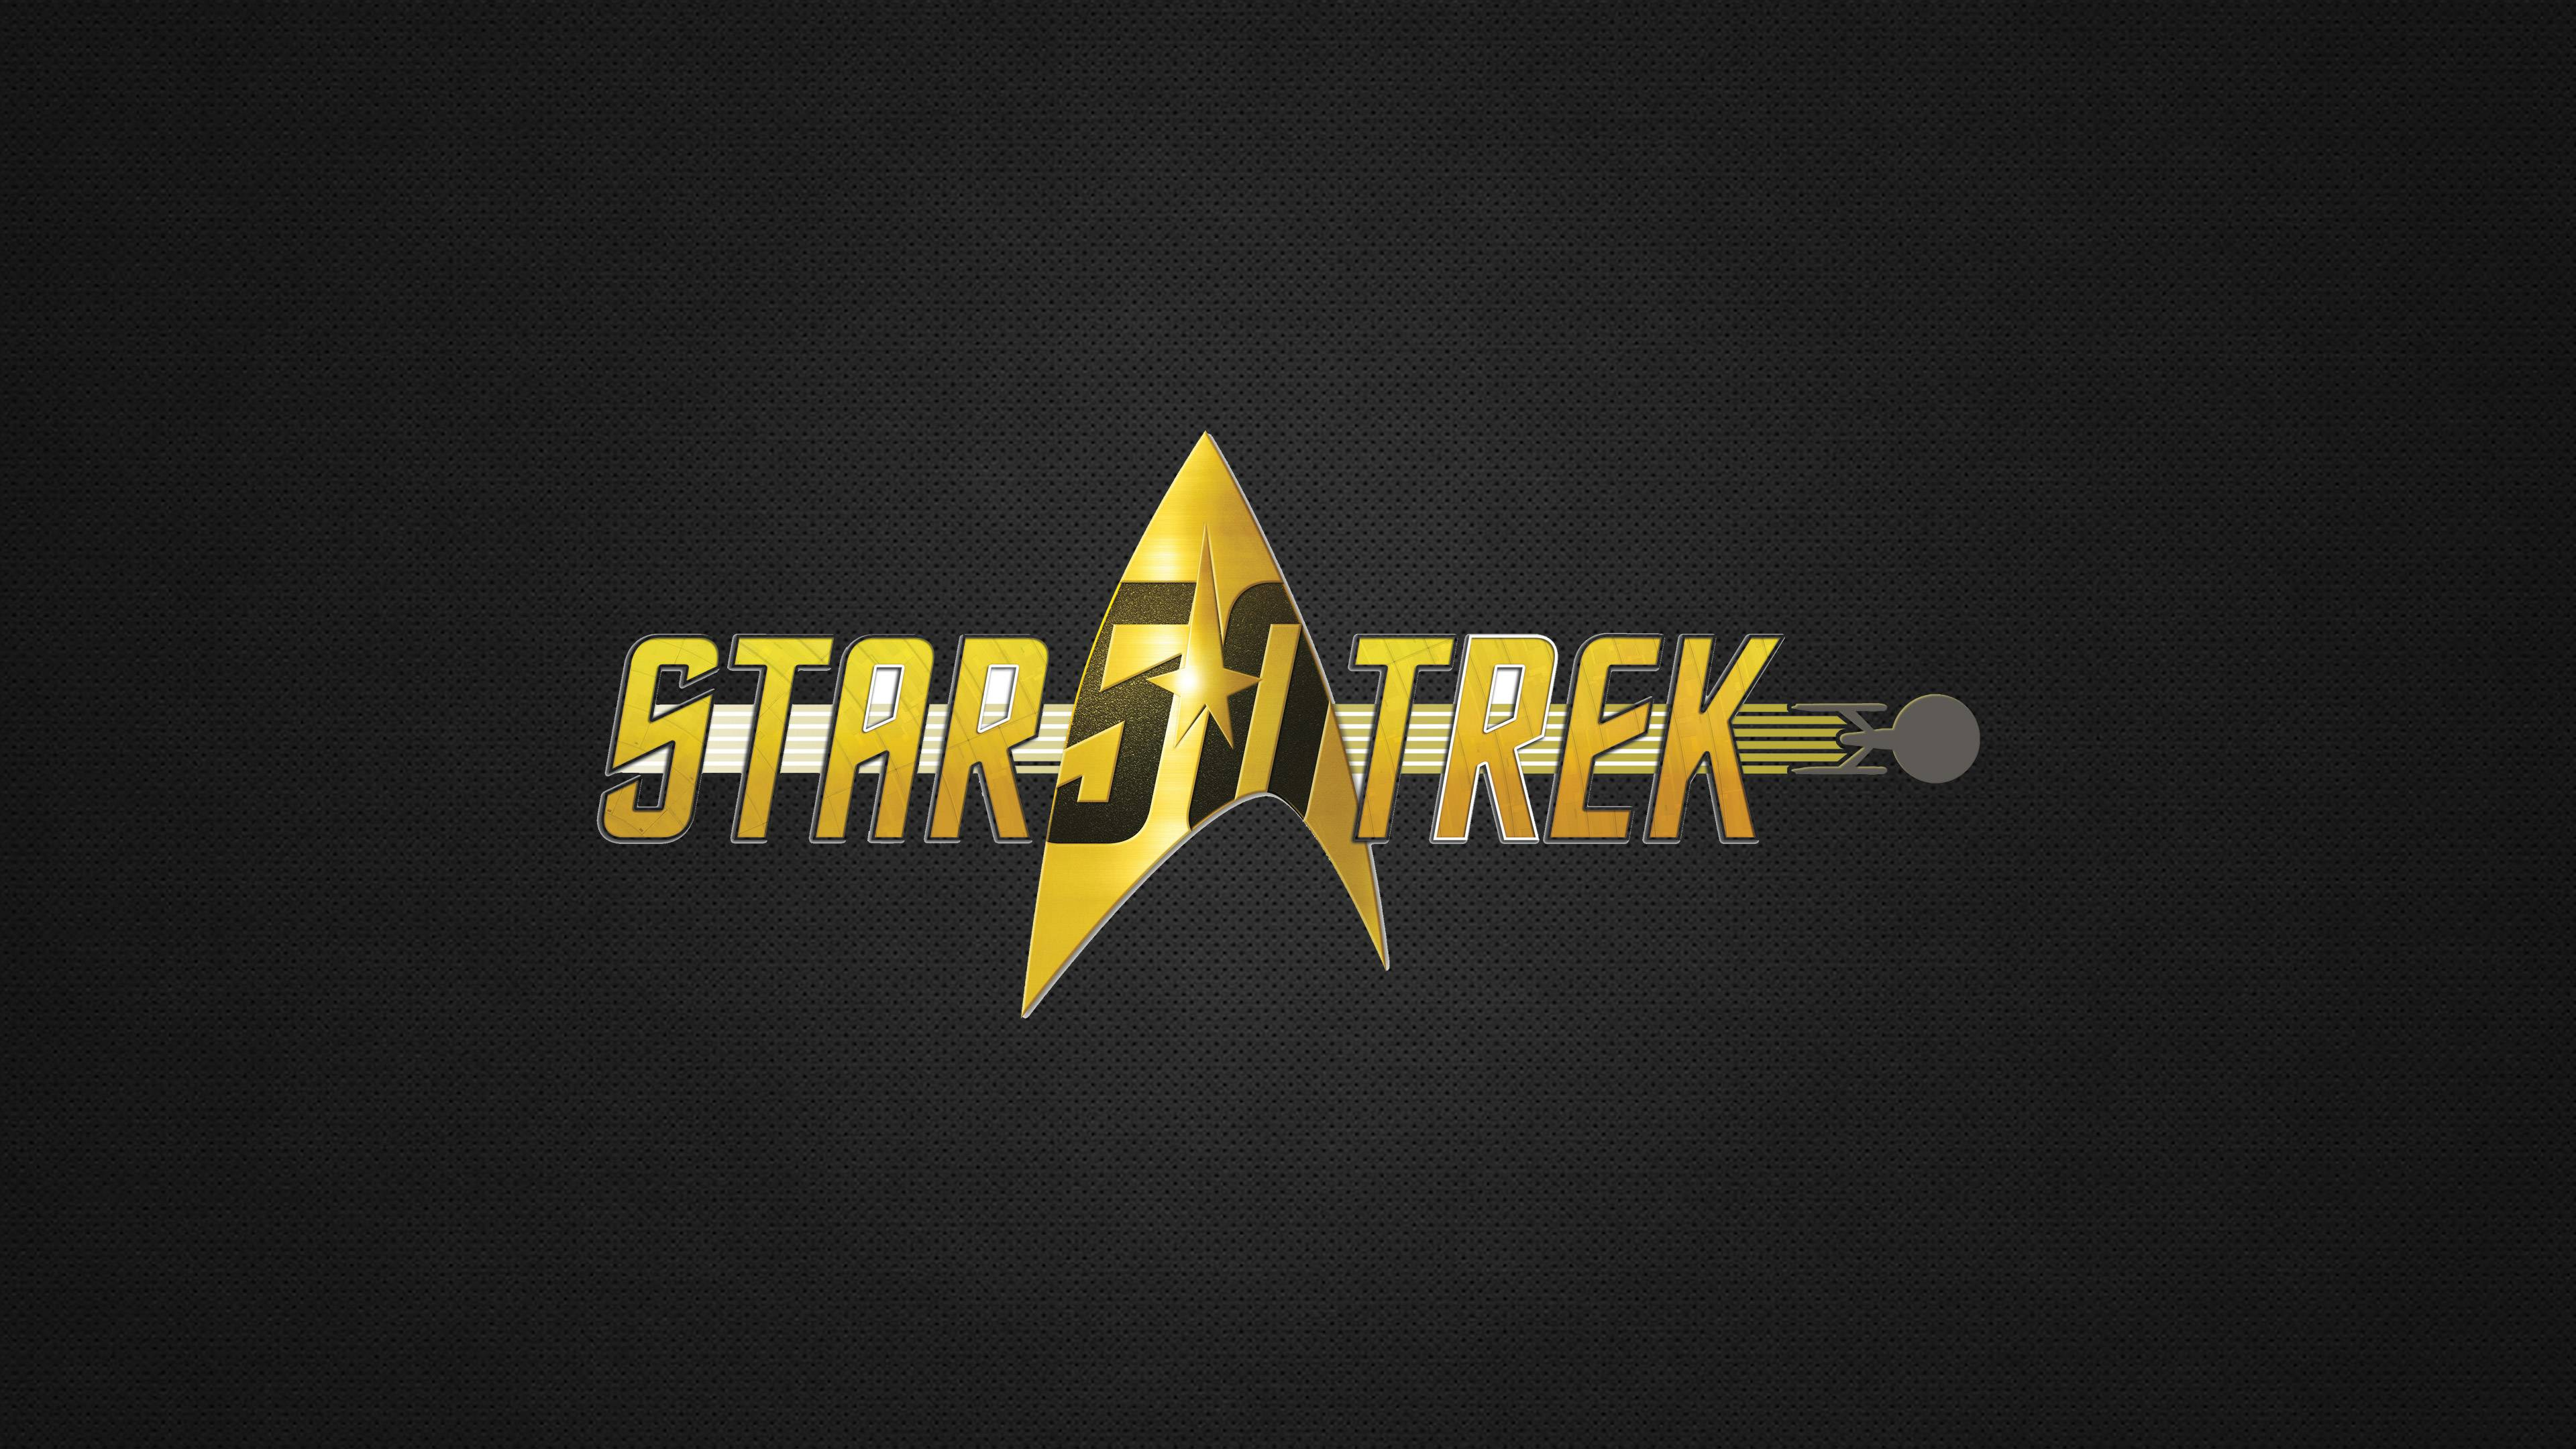 2048x1152 star trek 50th anniversary 2048x1152 resolution - Star trek symbol wallpaper ...